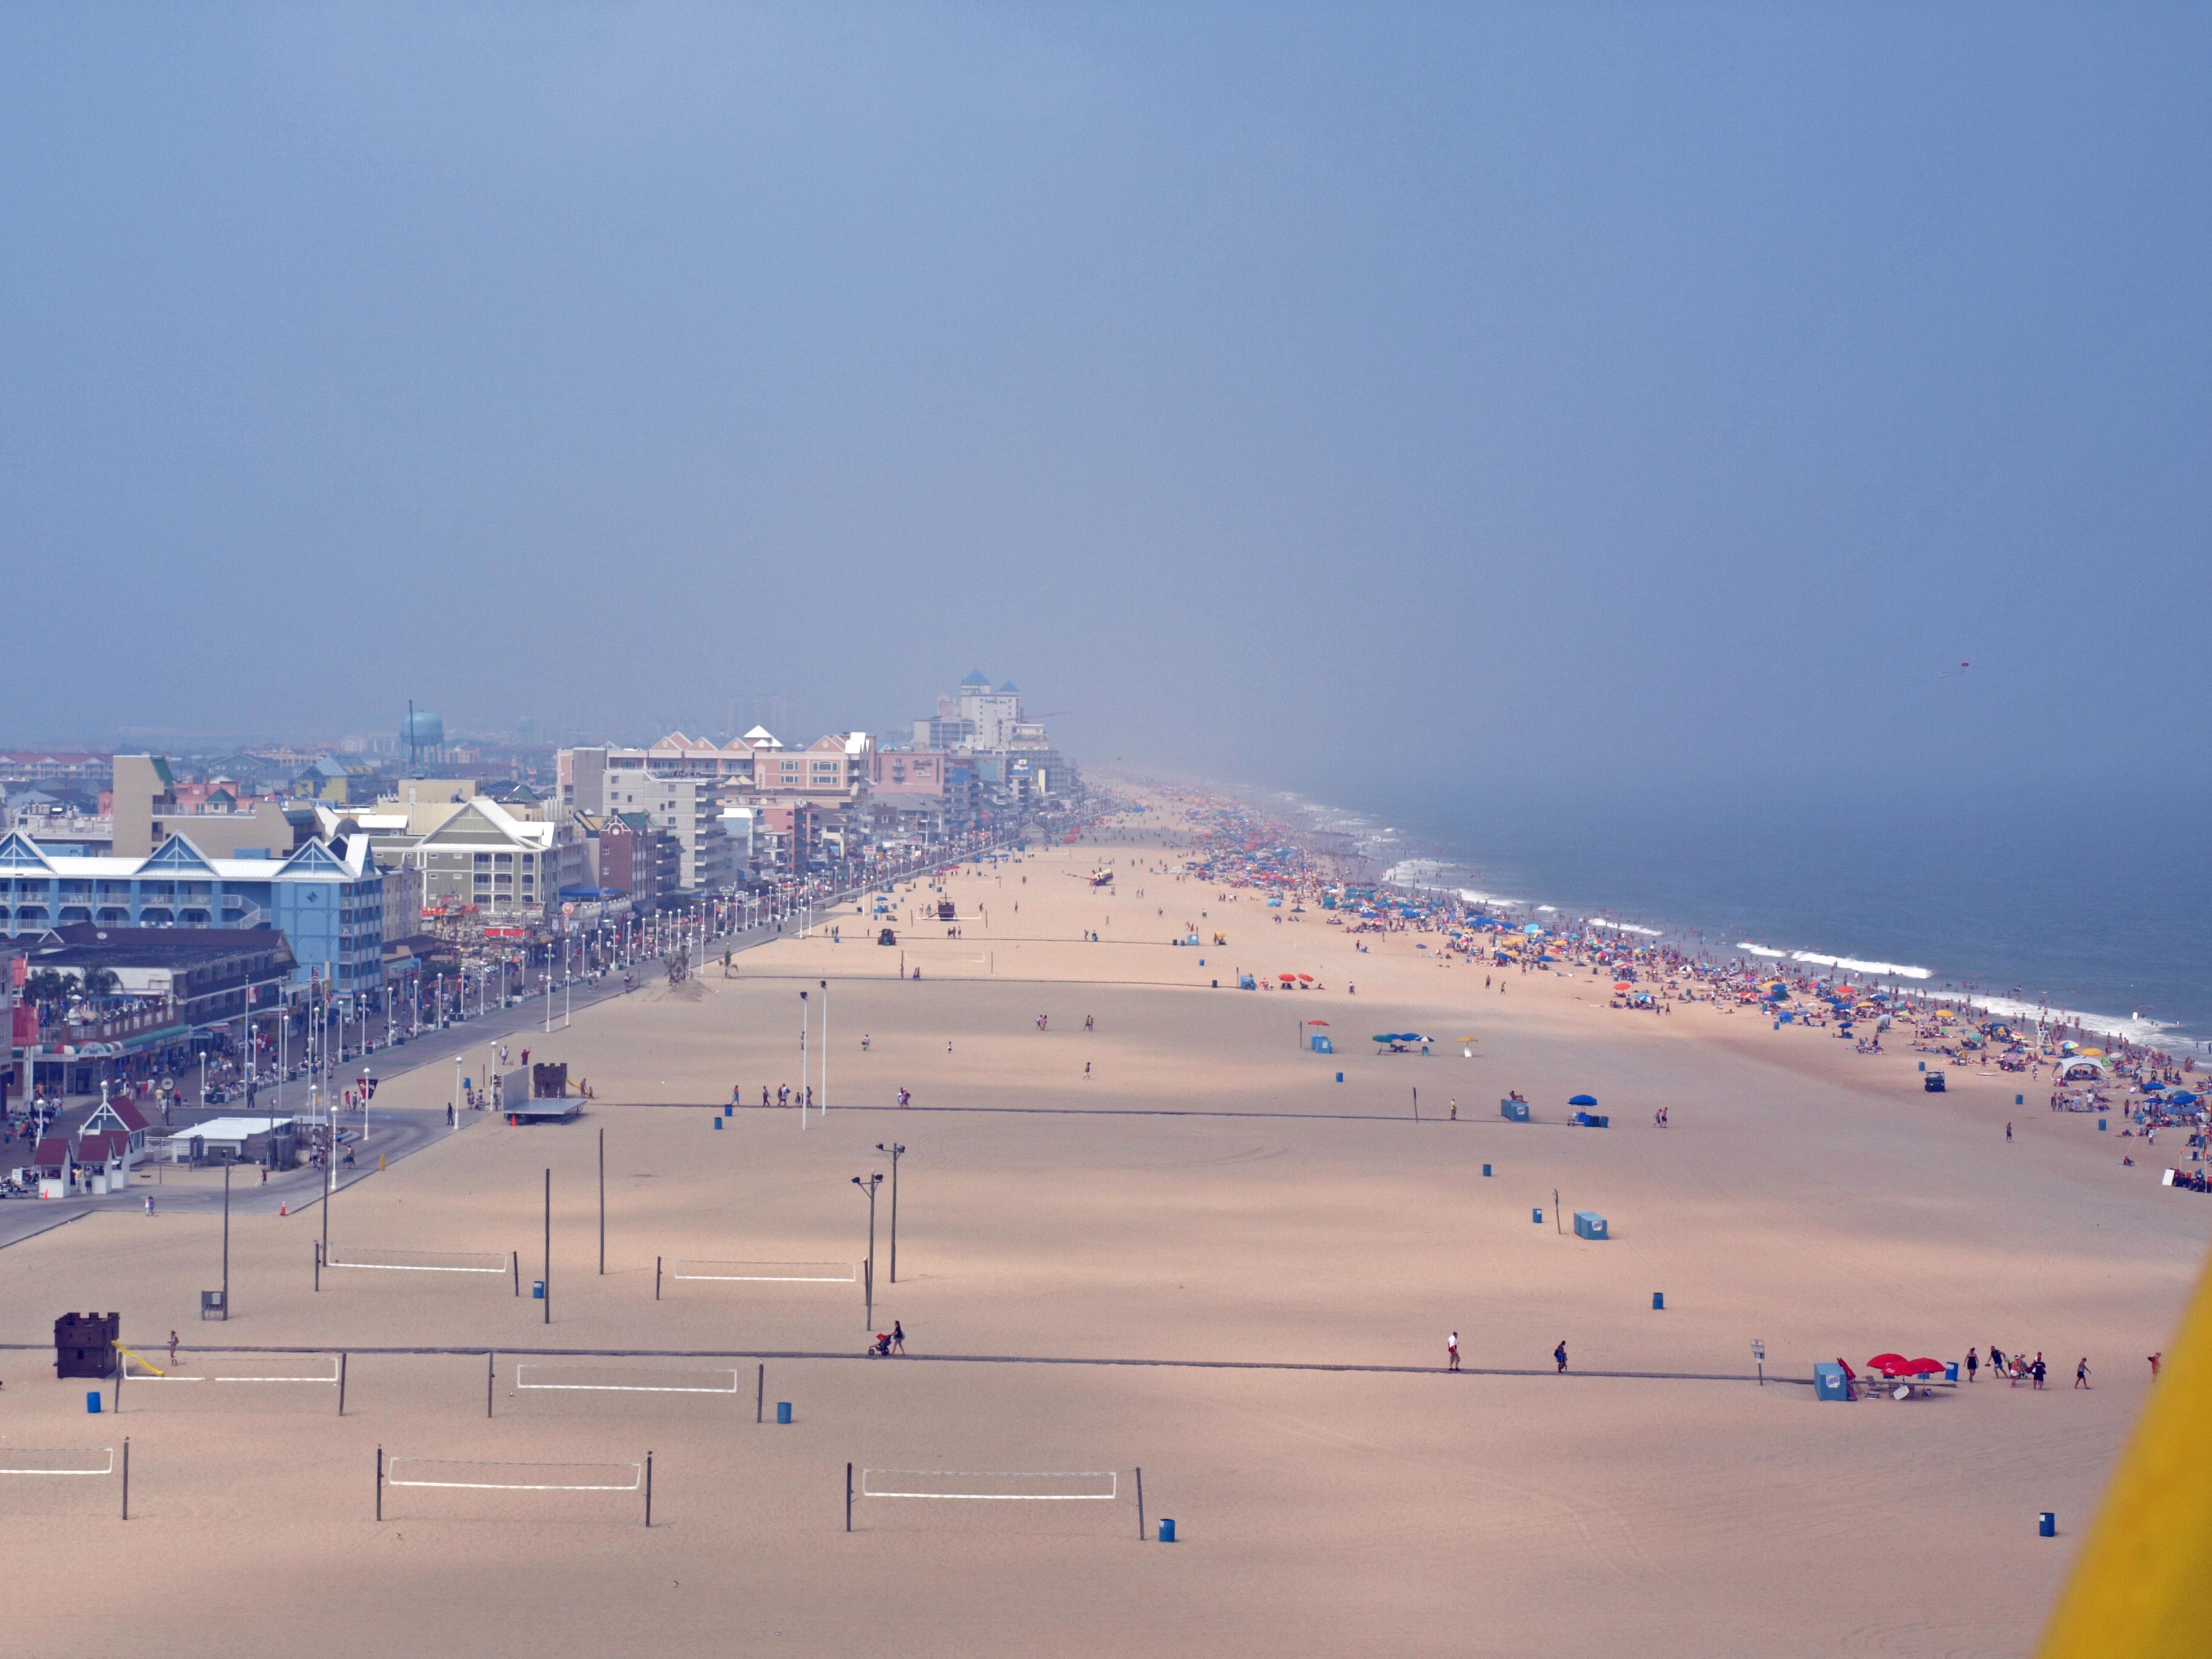 ncbeachview.jpg - View of Ocean City, Maryland